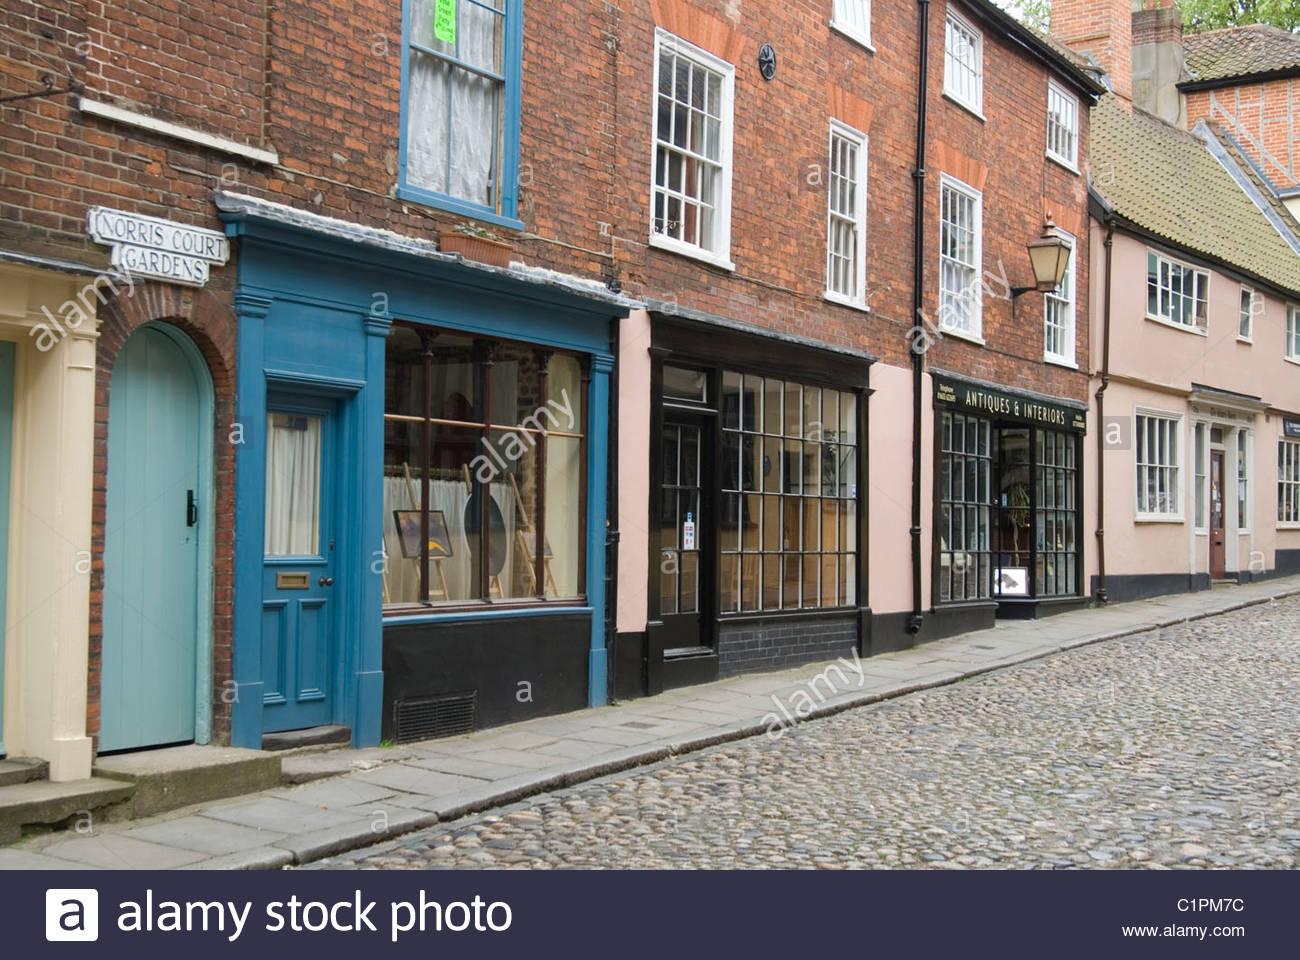 UK, England, Norfolk, Norwich, Elm Hill, row of shops - Stock Image